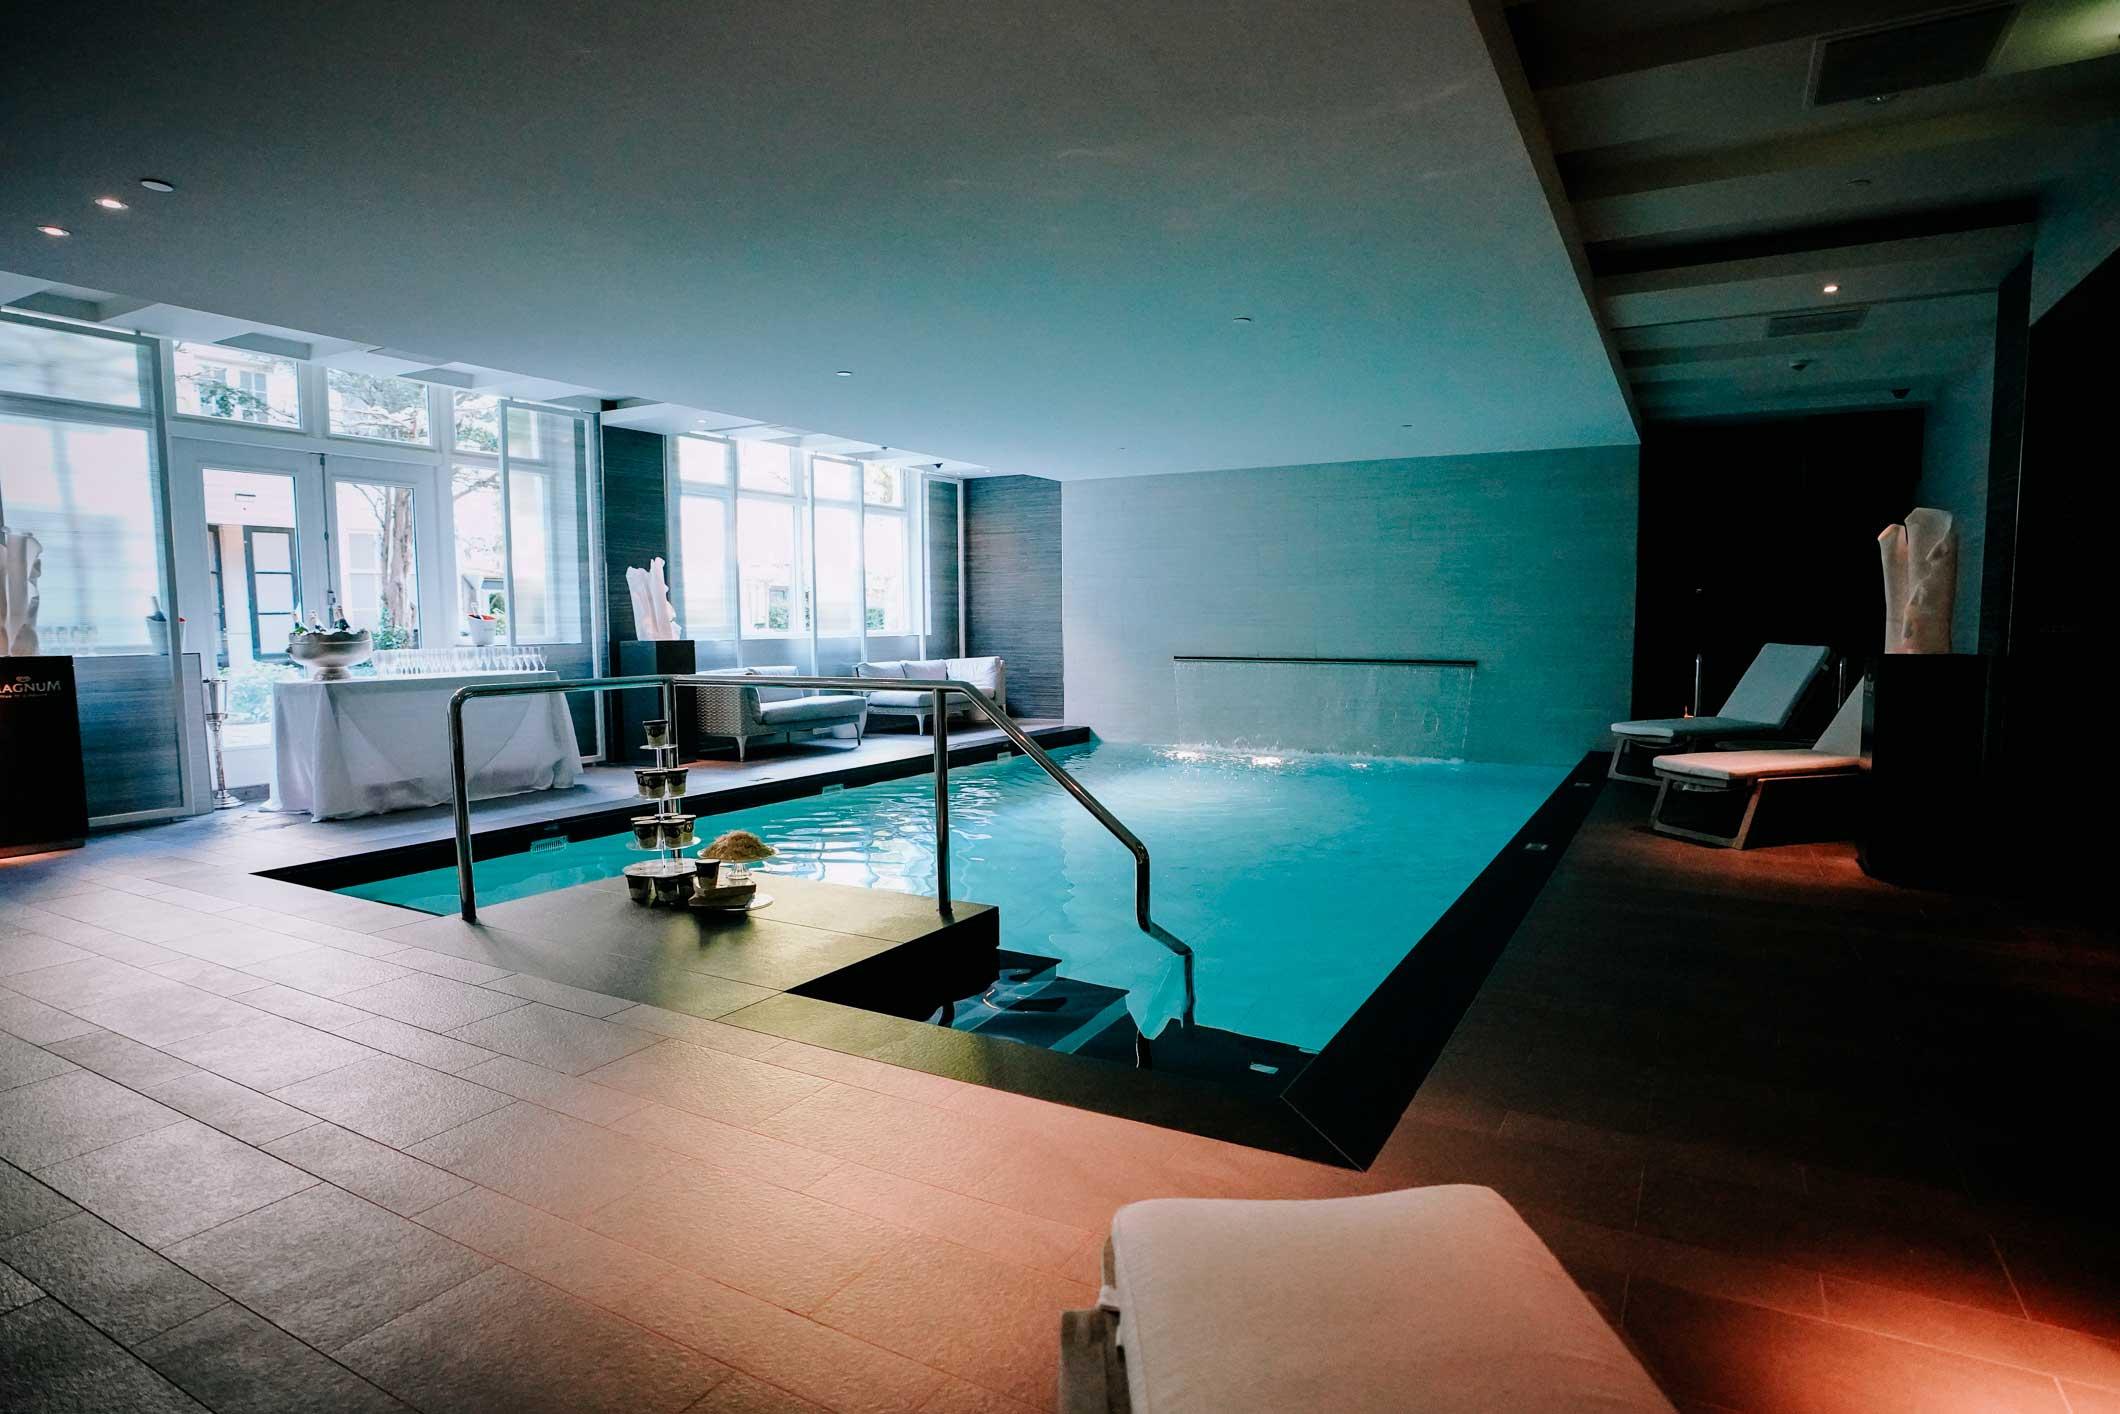 Ilsoo_van_dijk_Magnum_playground_Conservatorium_hotel_2019-3-2